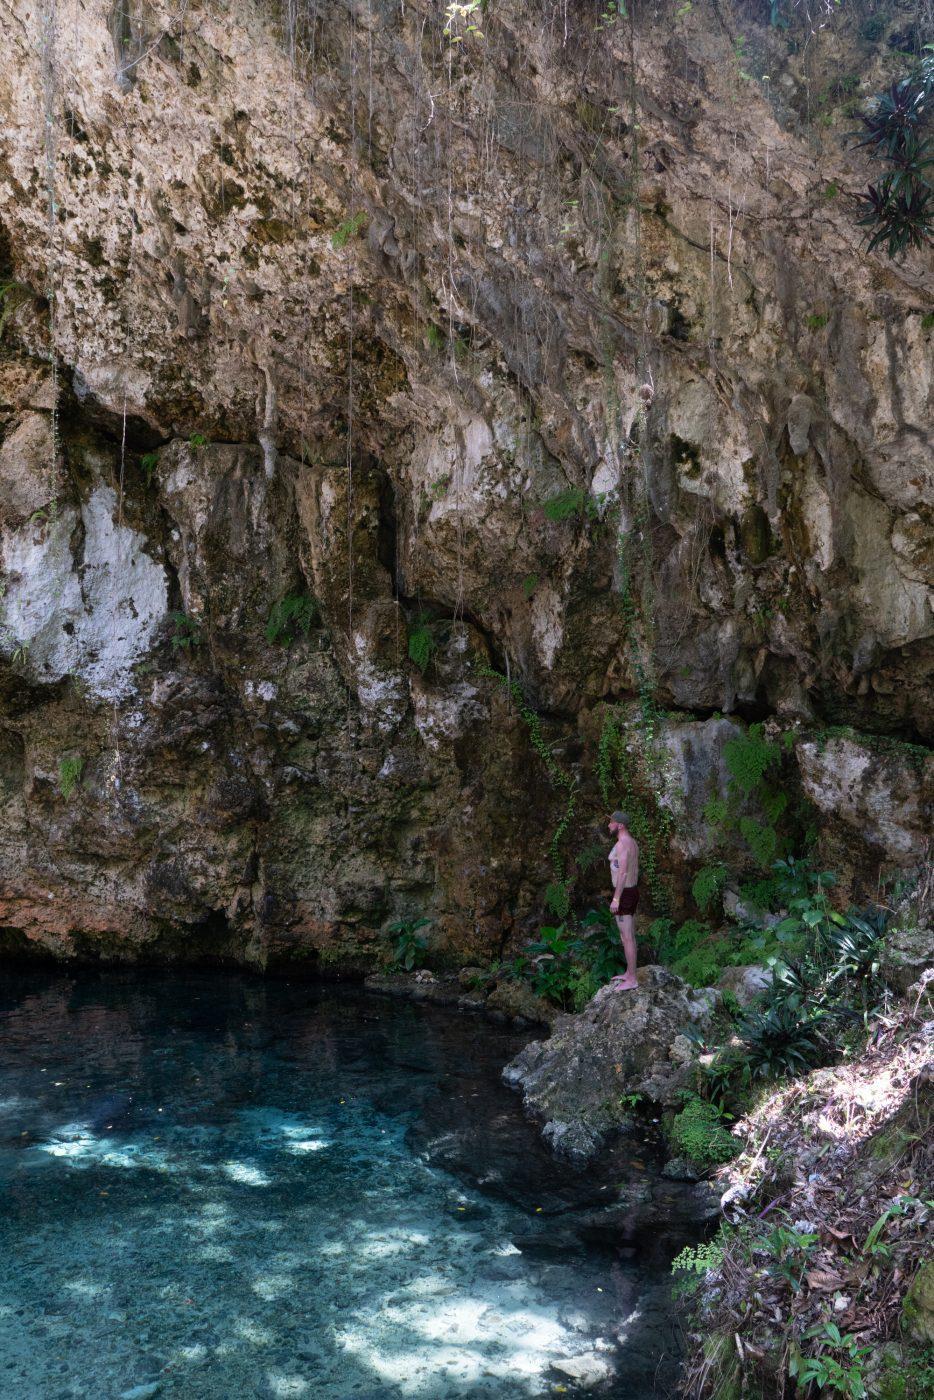 Lago Azul, not far from Laguna el Dudu, Dominican Republic